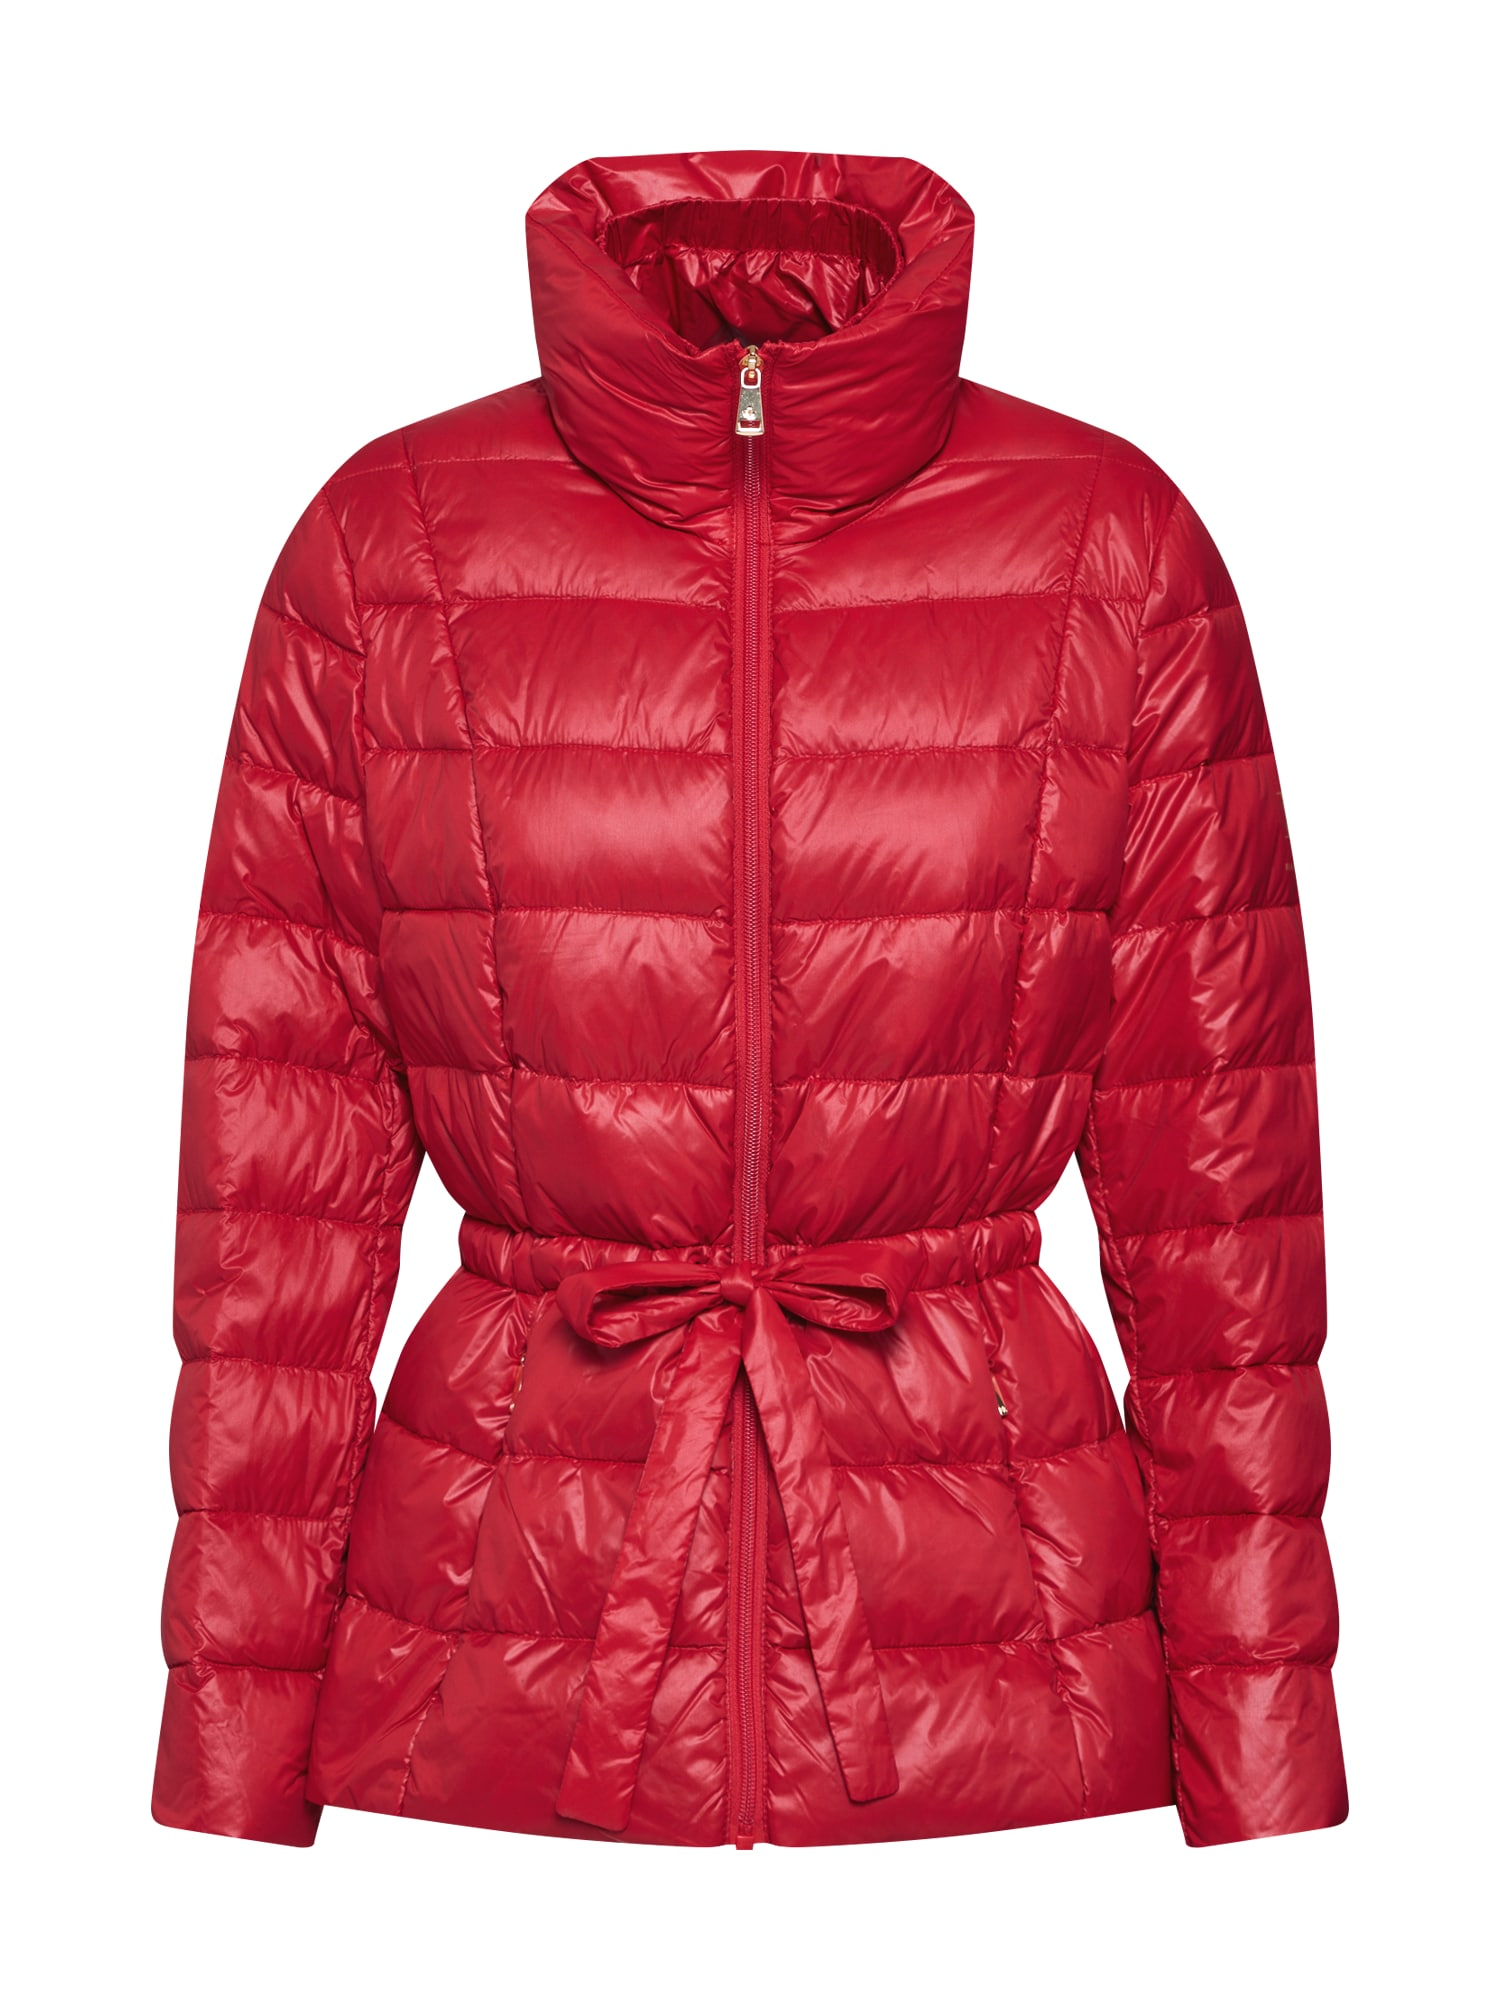 Zimní bunda PACKABLE RB-JACKET červená Lauren Ralph Lauren